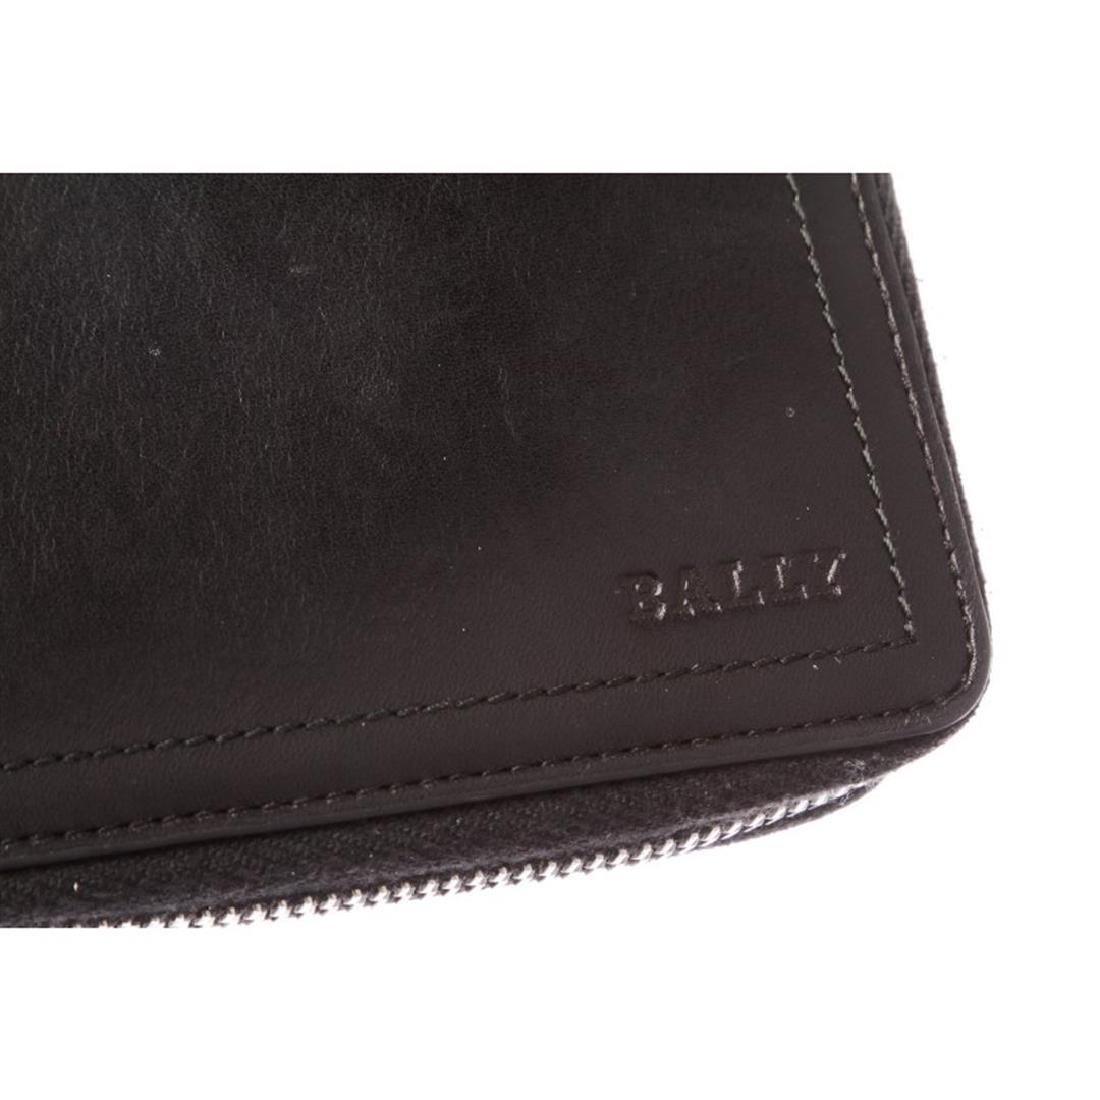 Bally Black Leather Long Zipper Wallet - 5